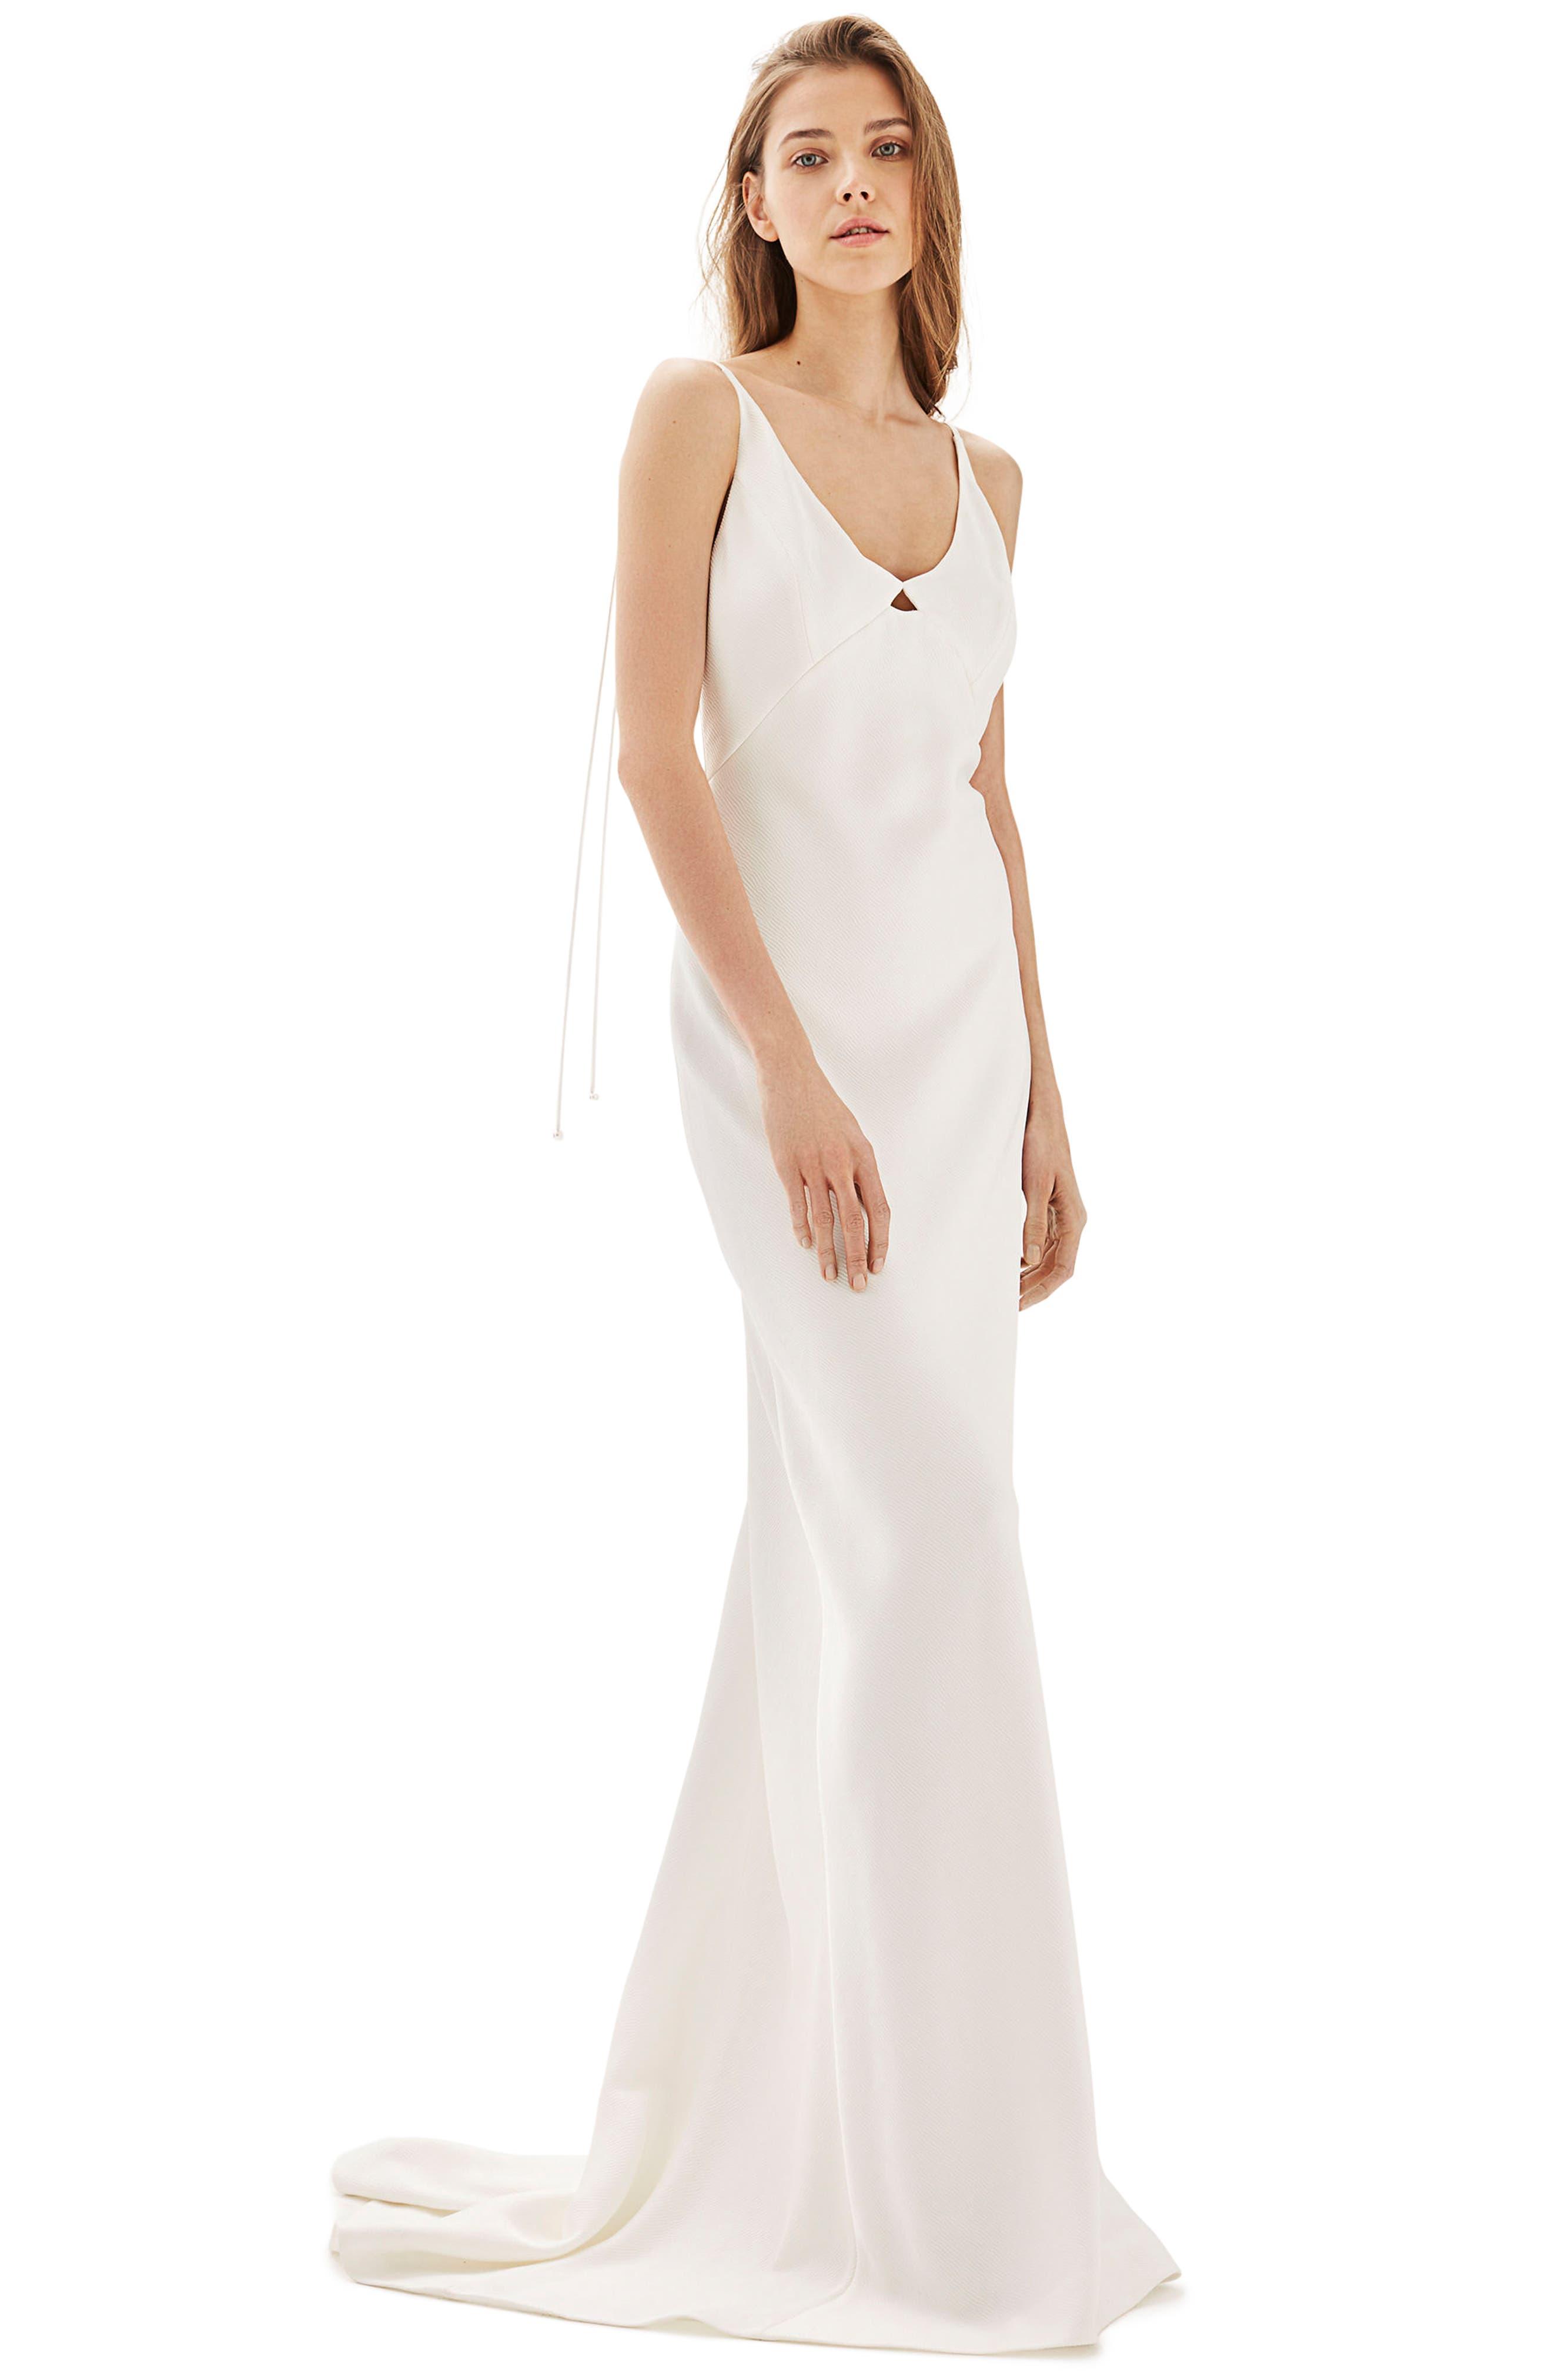 Topshop Bride V-Neck Satin Sheath Gown